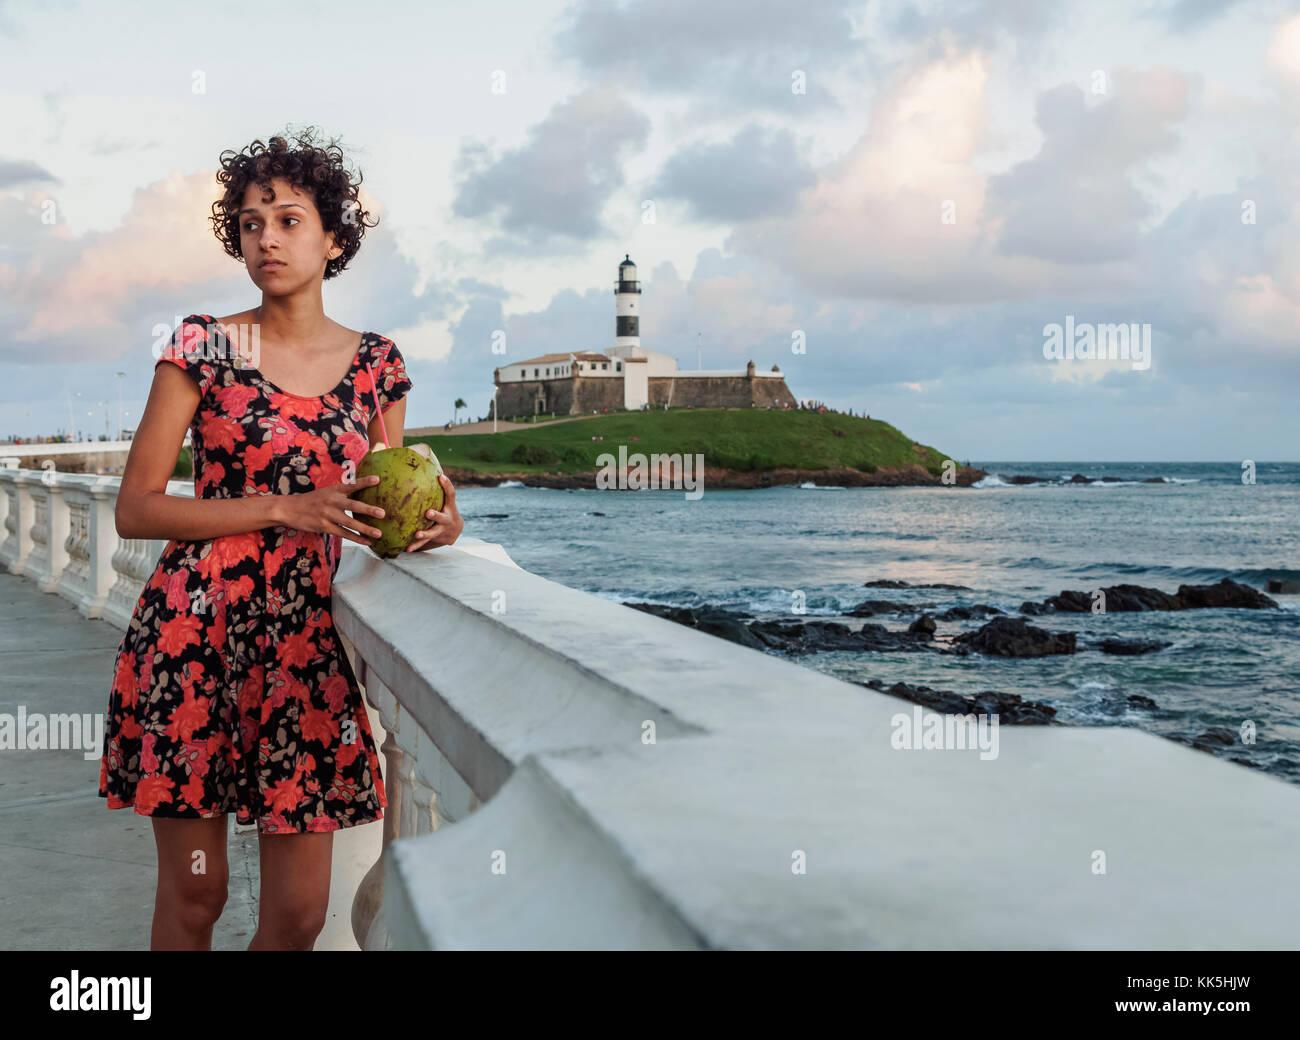 brazil bahia state brazilian girl stockfotos brazil bahia state brazilian girl bilder alamy. Black Bedroom Furniture Sets. Home Design Ideas